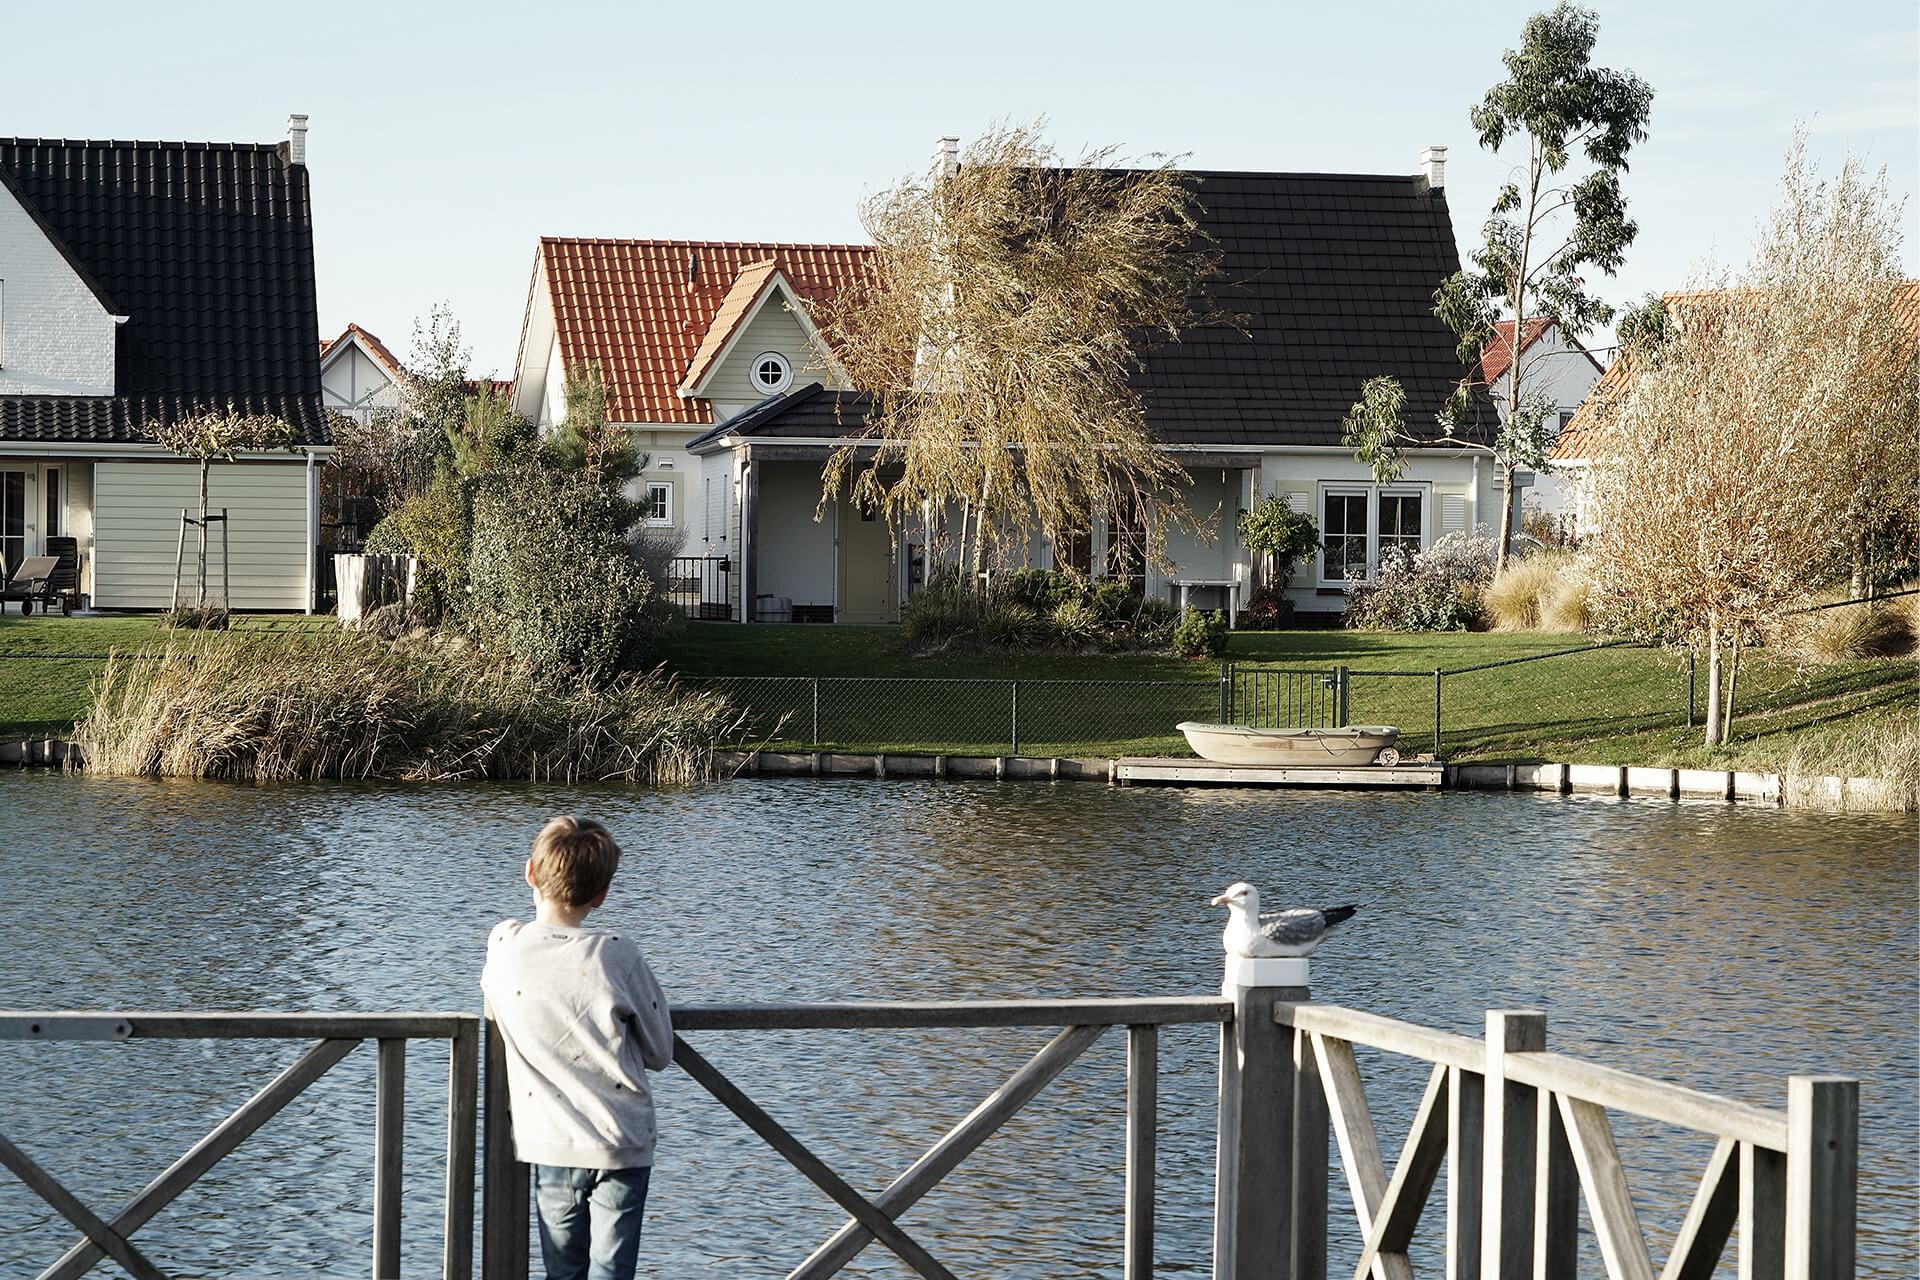 Leisure Architectuur - Noordzee Résidence Cadzand-Bad - Jongen op bootsteiger